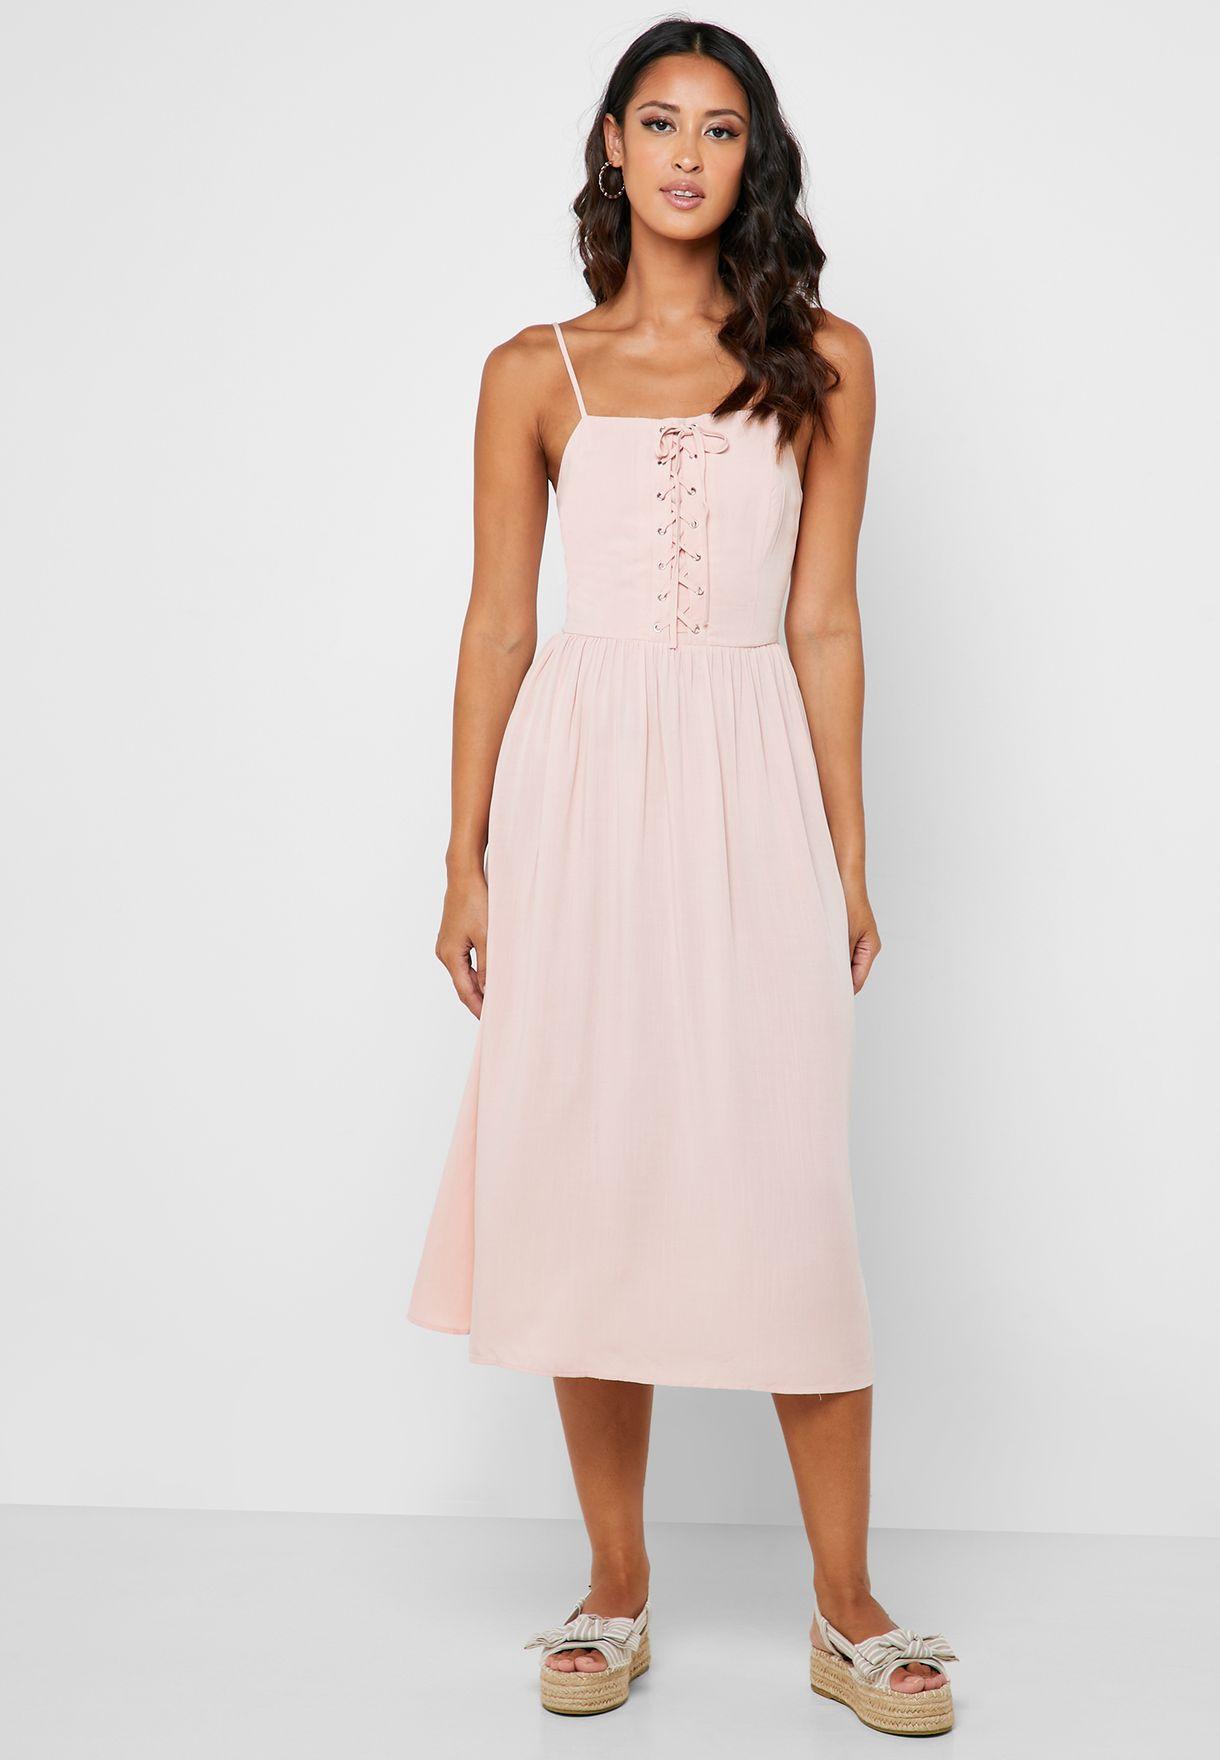 Lace Up Eyelet Cami Dress